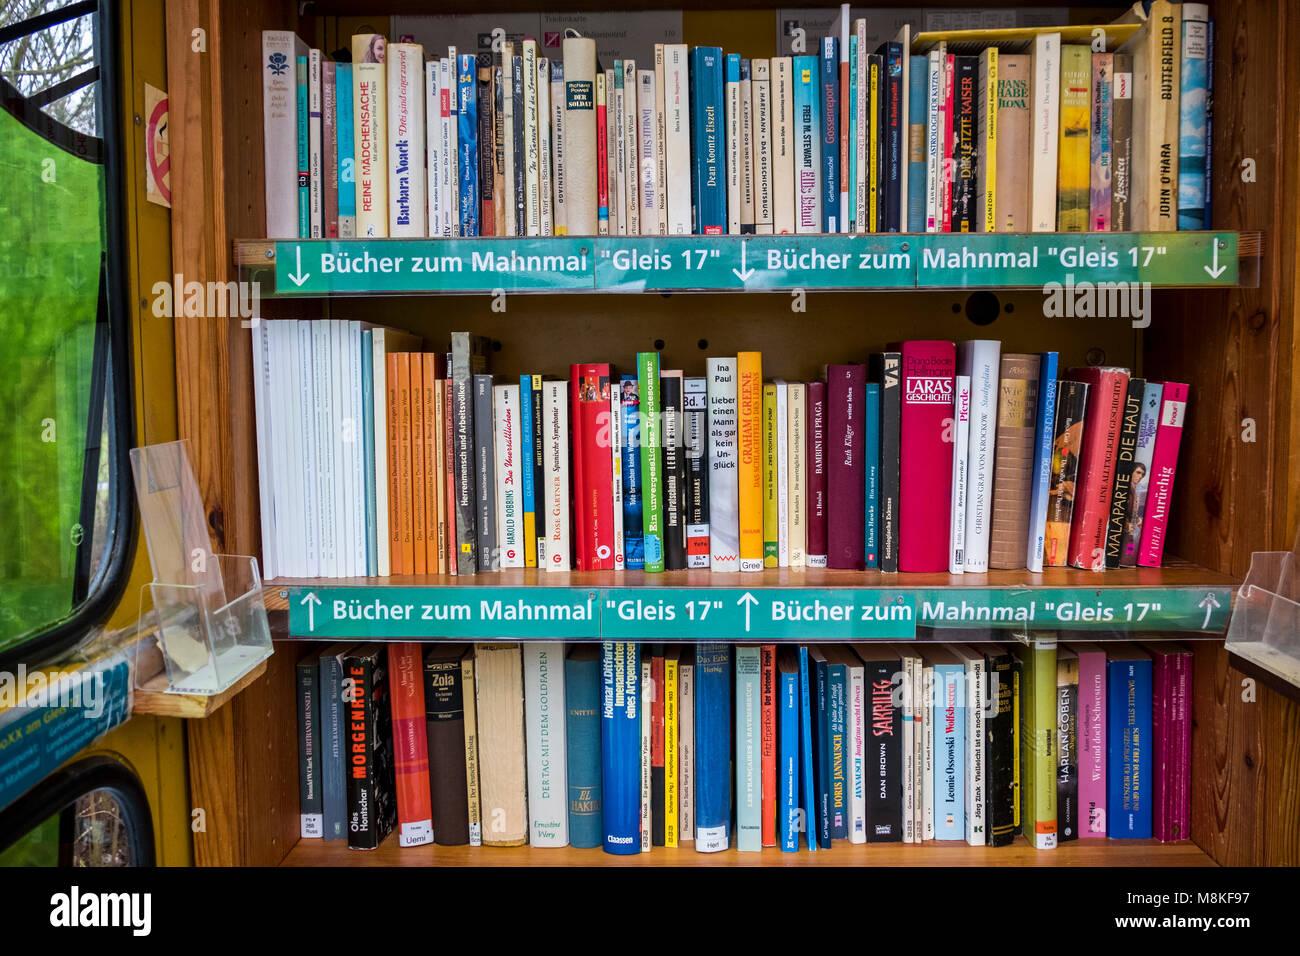 Berlin-Grunewald.Telephone kiosk,BücherboXX,book box. A small 'honesty library' with books.A shelf has books - Stock Image